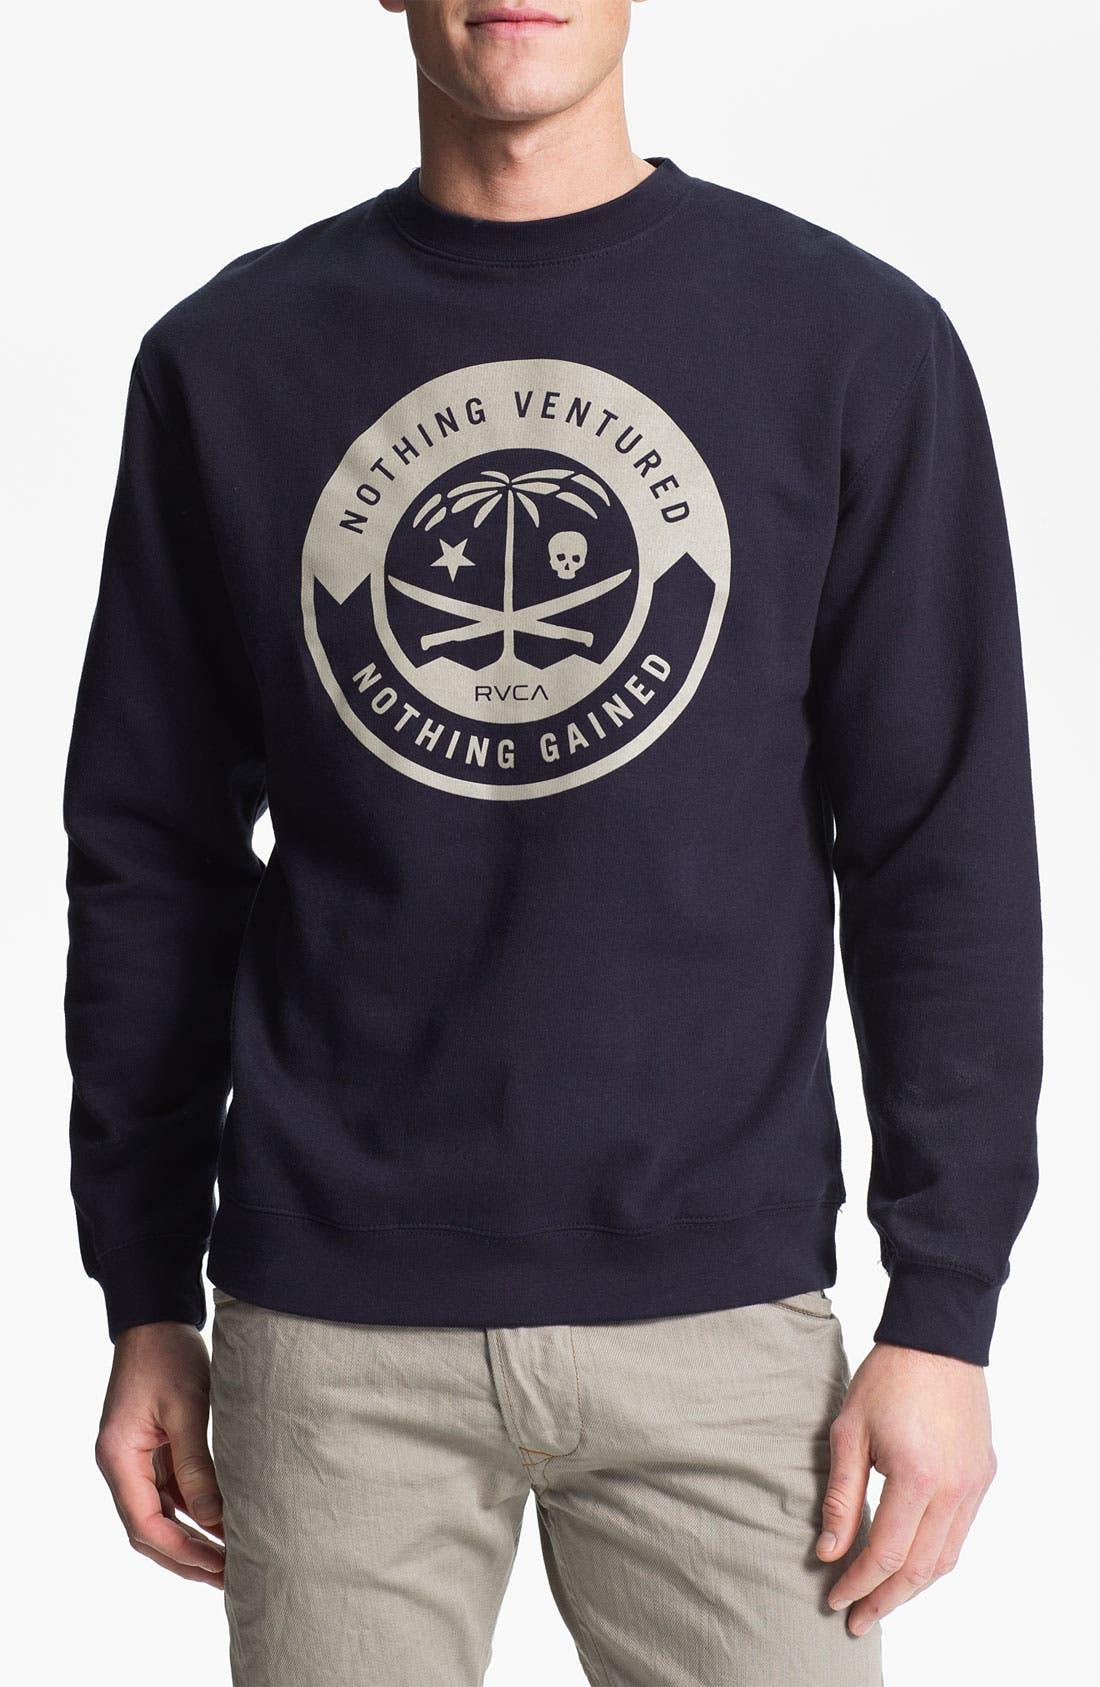 Alternate Image 1 Selected - RVCA 'Korps' Graphic Crewneck Sweatshirt